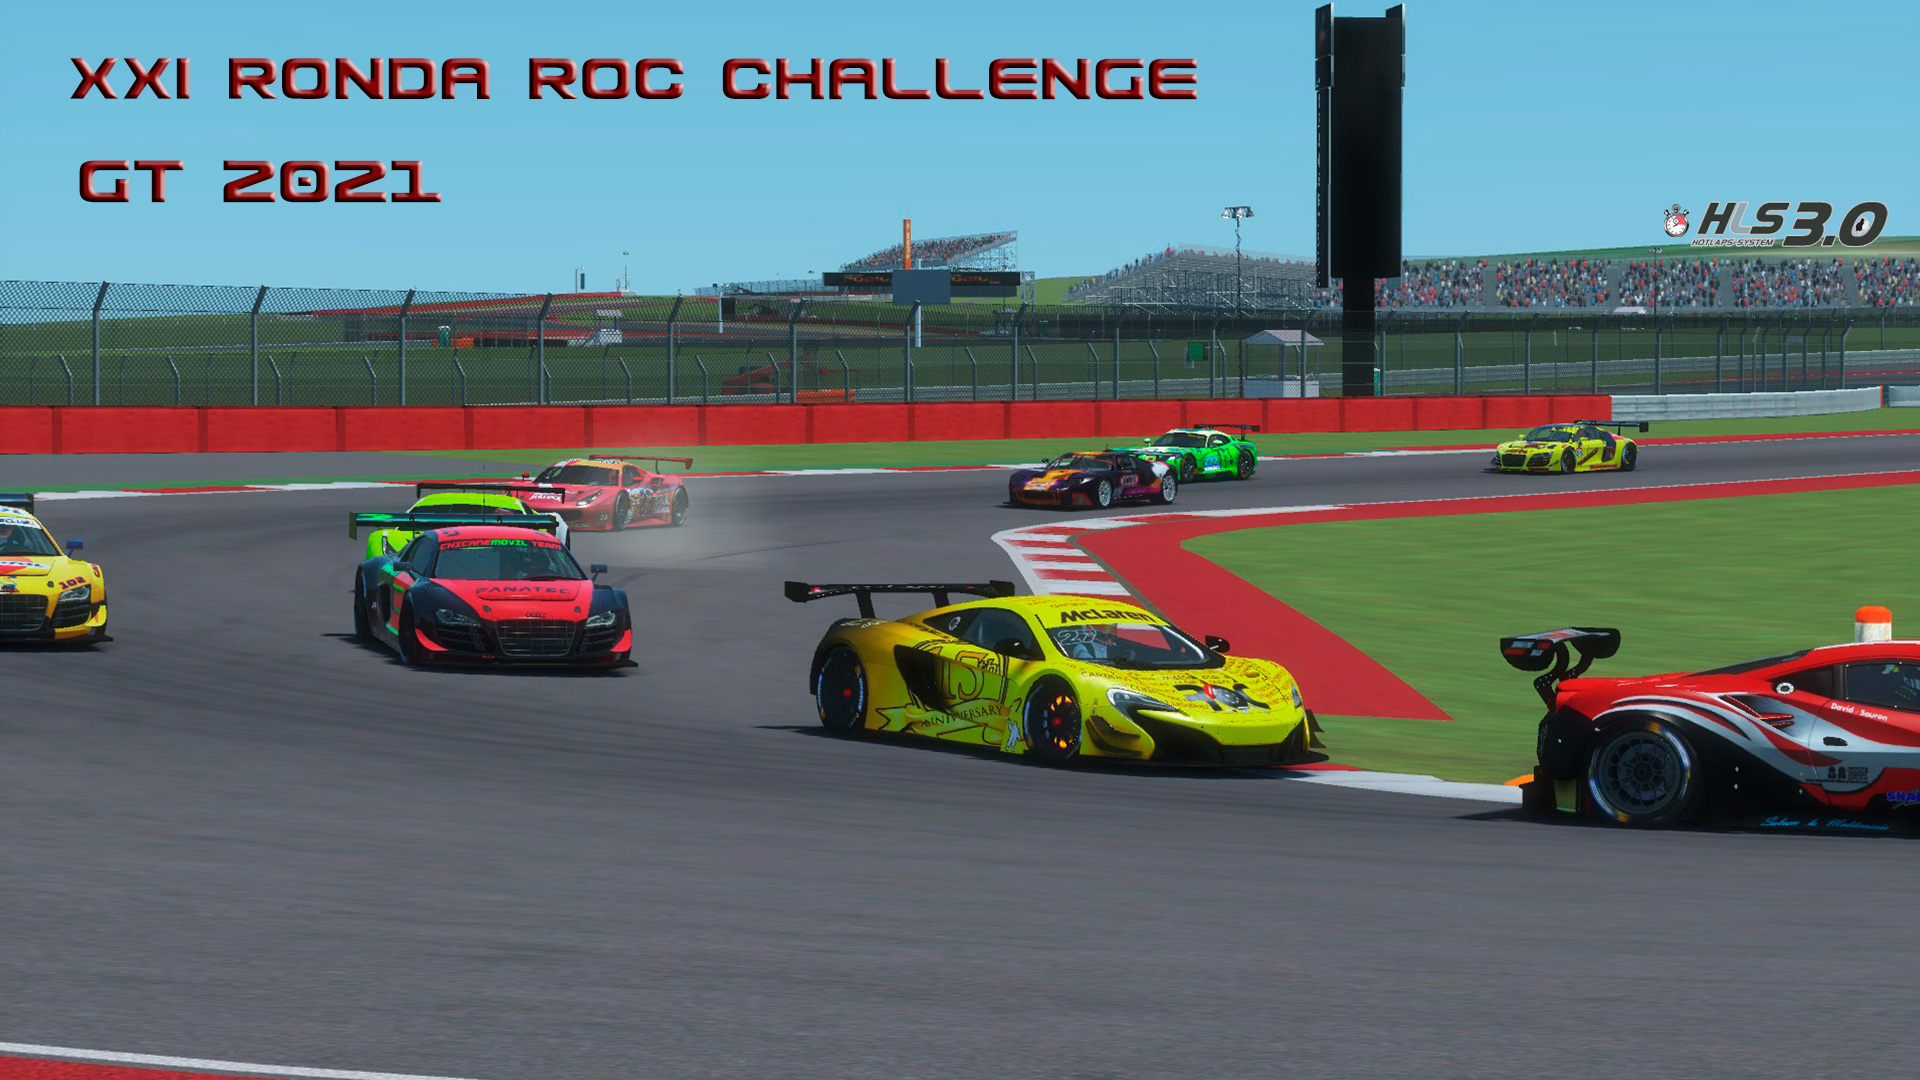 XXI Ronda ROC Challenge GT 2021